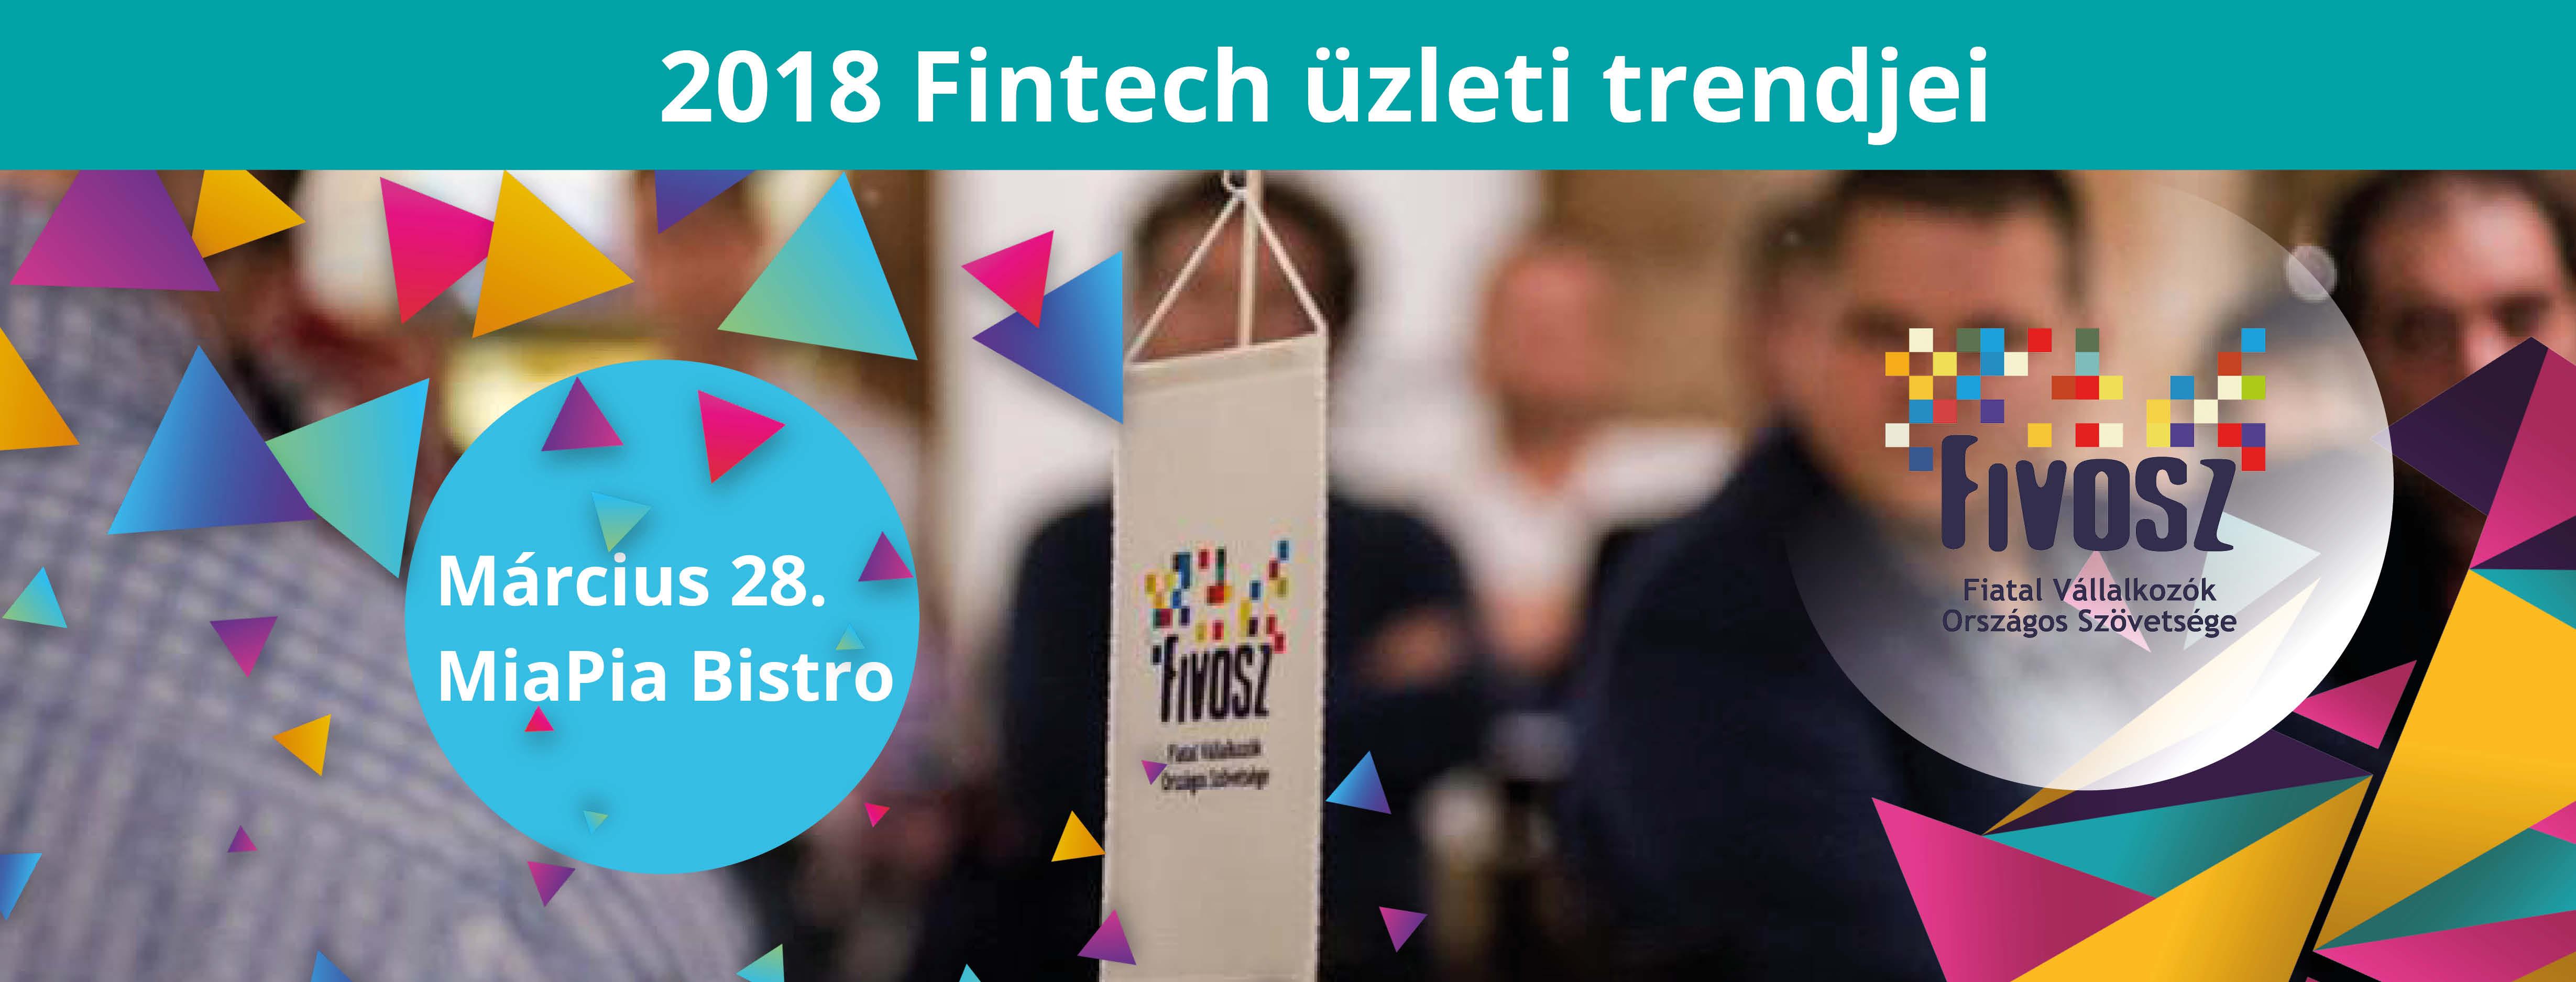 FIVOSZ EST- 2018 Fintech üzleti trendjei.